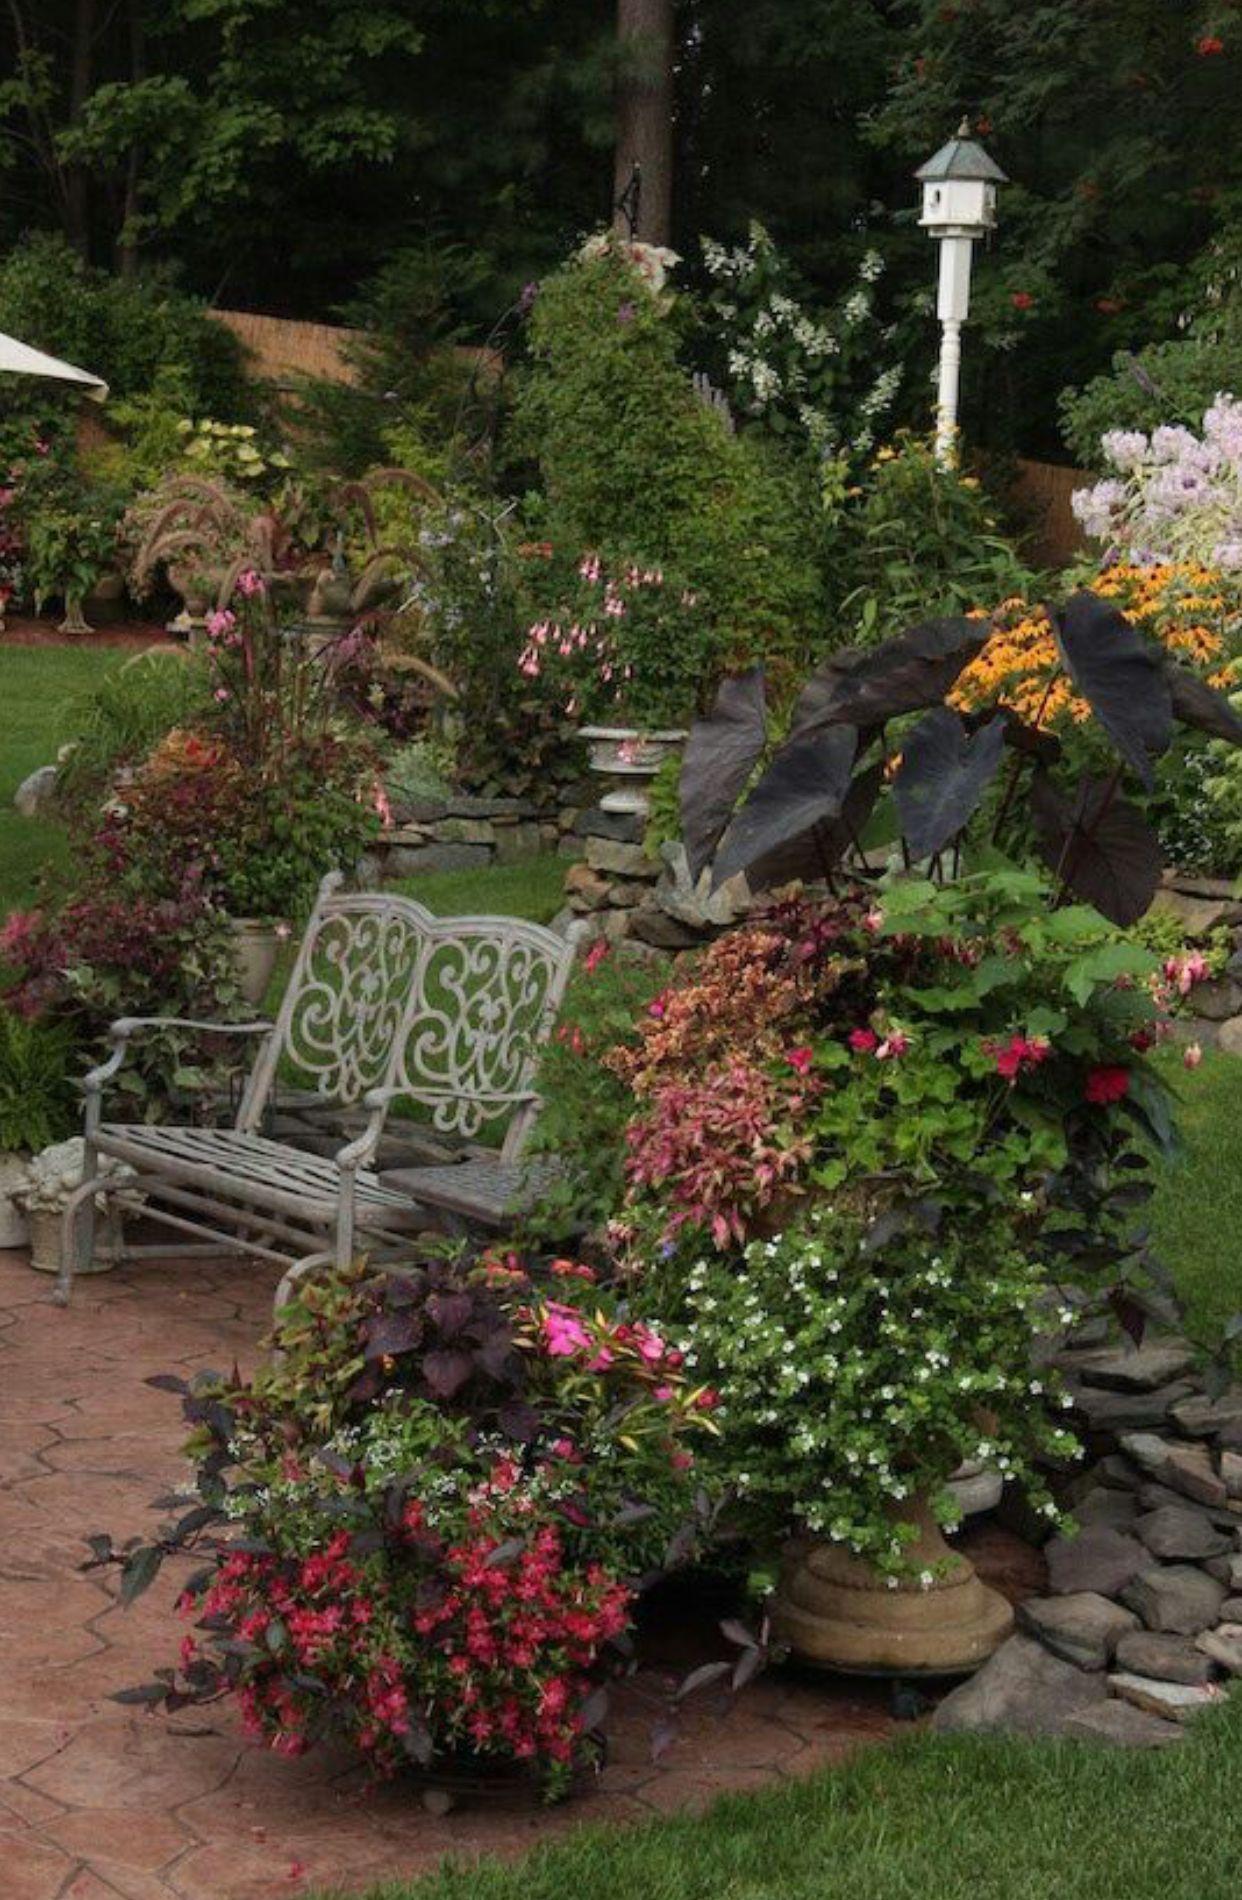 Colourful garden   Garden   Pinterest   Gardens, Paths and Landscaping